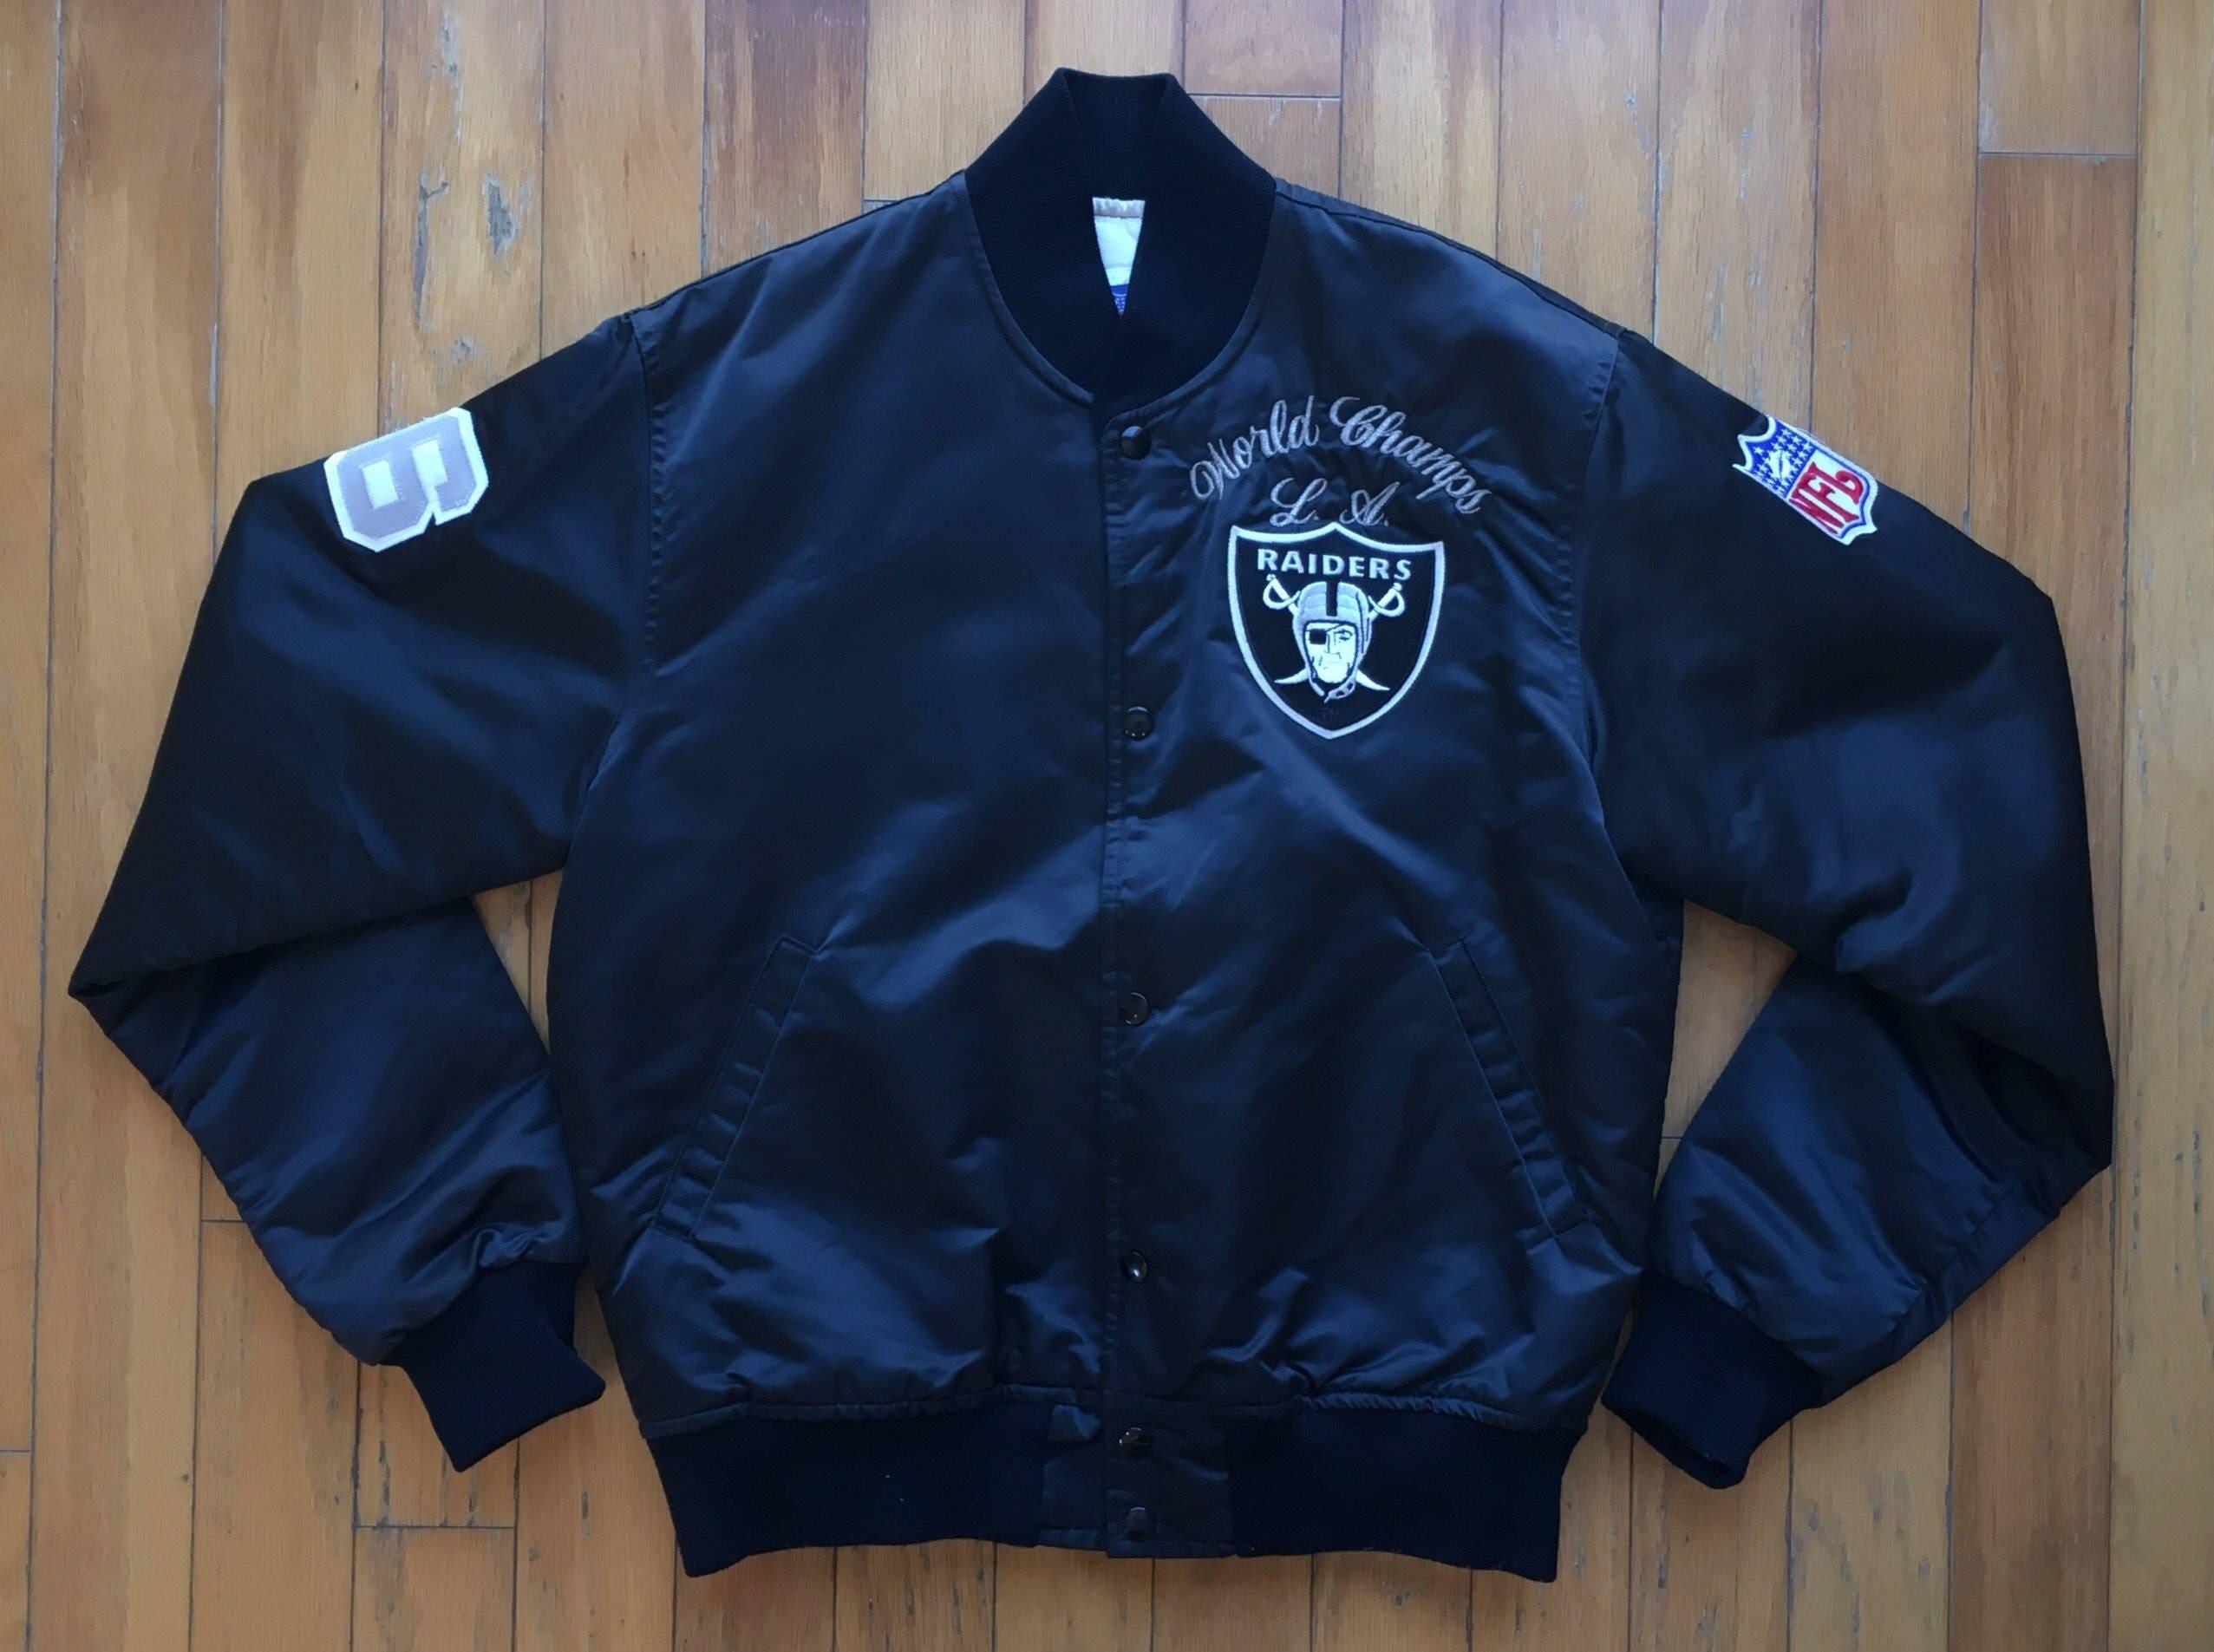 Vintage Cleveland Cavaliers Starter Satin Jacket 1980s RARE NBA XL Great Condition Varsity Style Bomber Letterman Coat Silk Lebron James c6zyVI